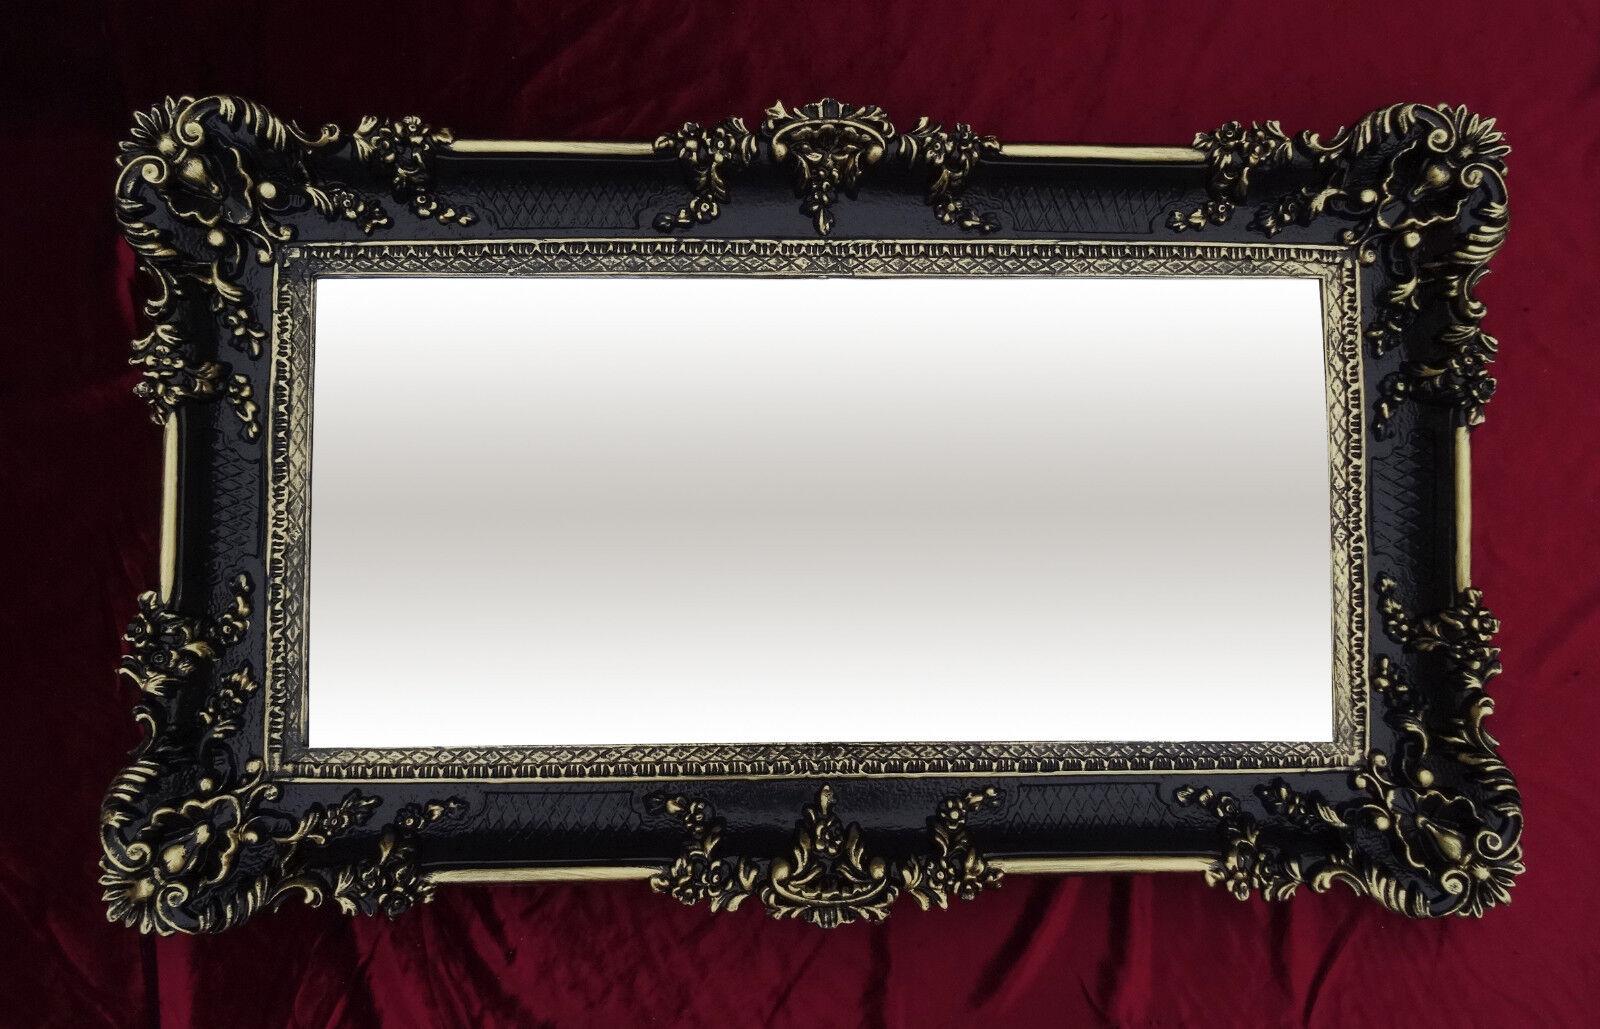 wandspiegel rechteckig schwarz gold dual barock wanddeko antik spiegel 96x57 ebay. Black Bedroom Furniture Sets. Home Design Ideas